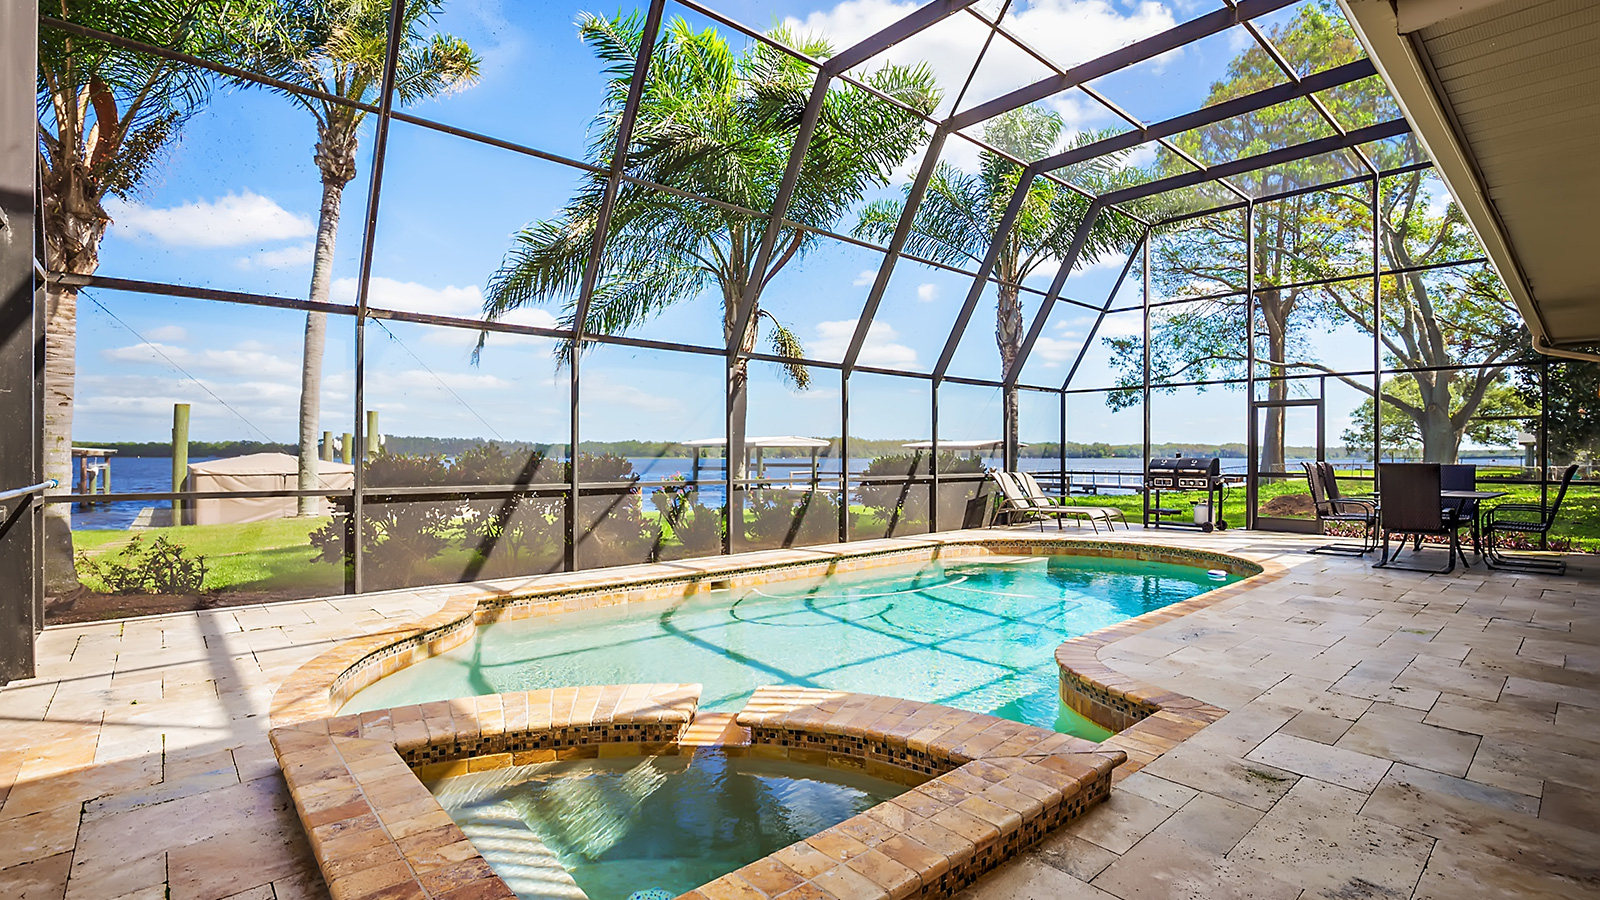 Florida Sun Vacation Rentals Sunrise on Lake Tarpon